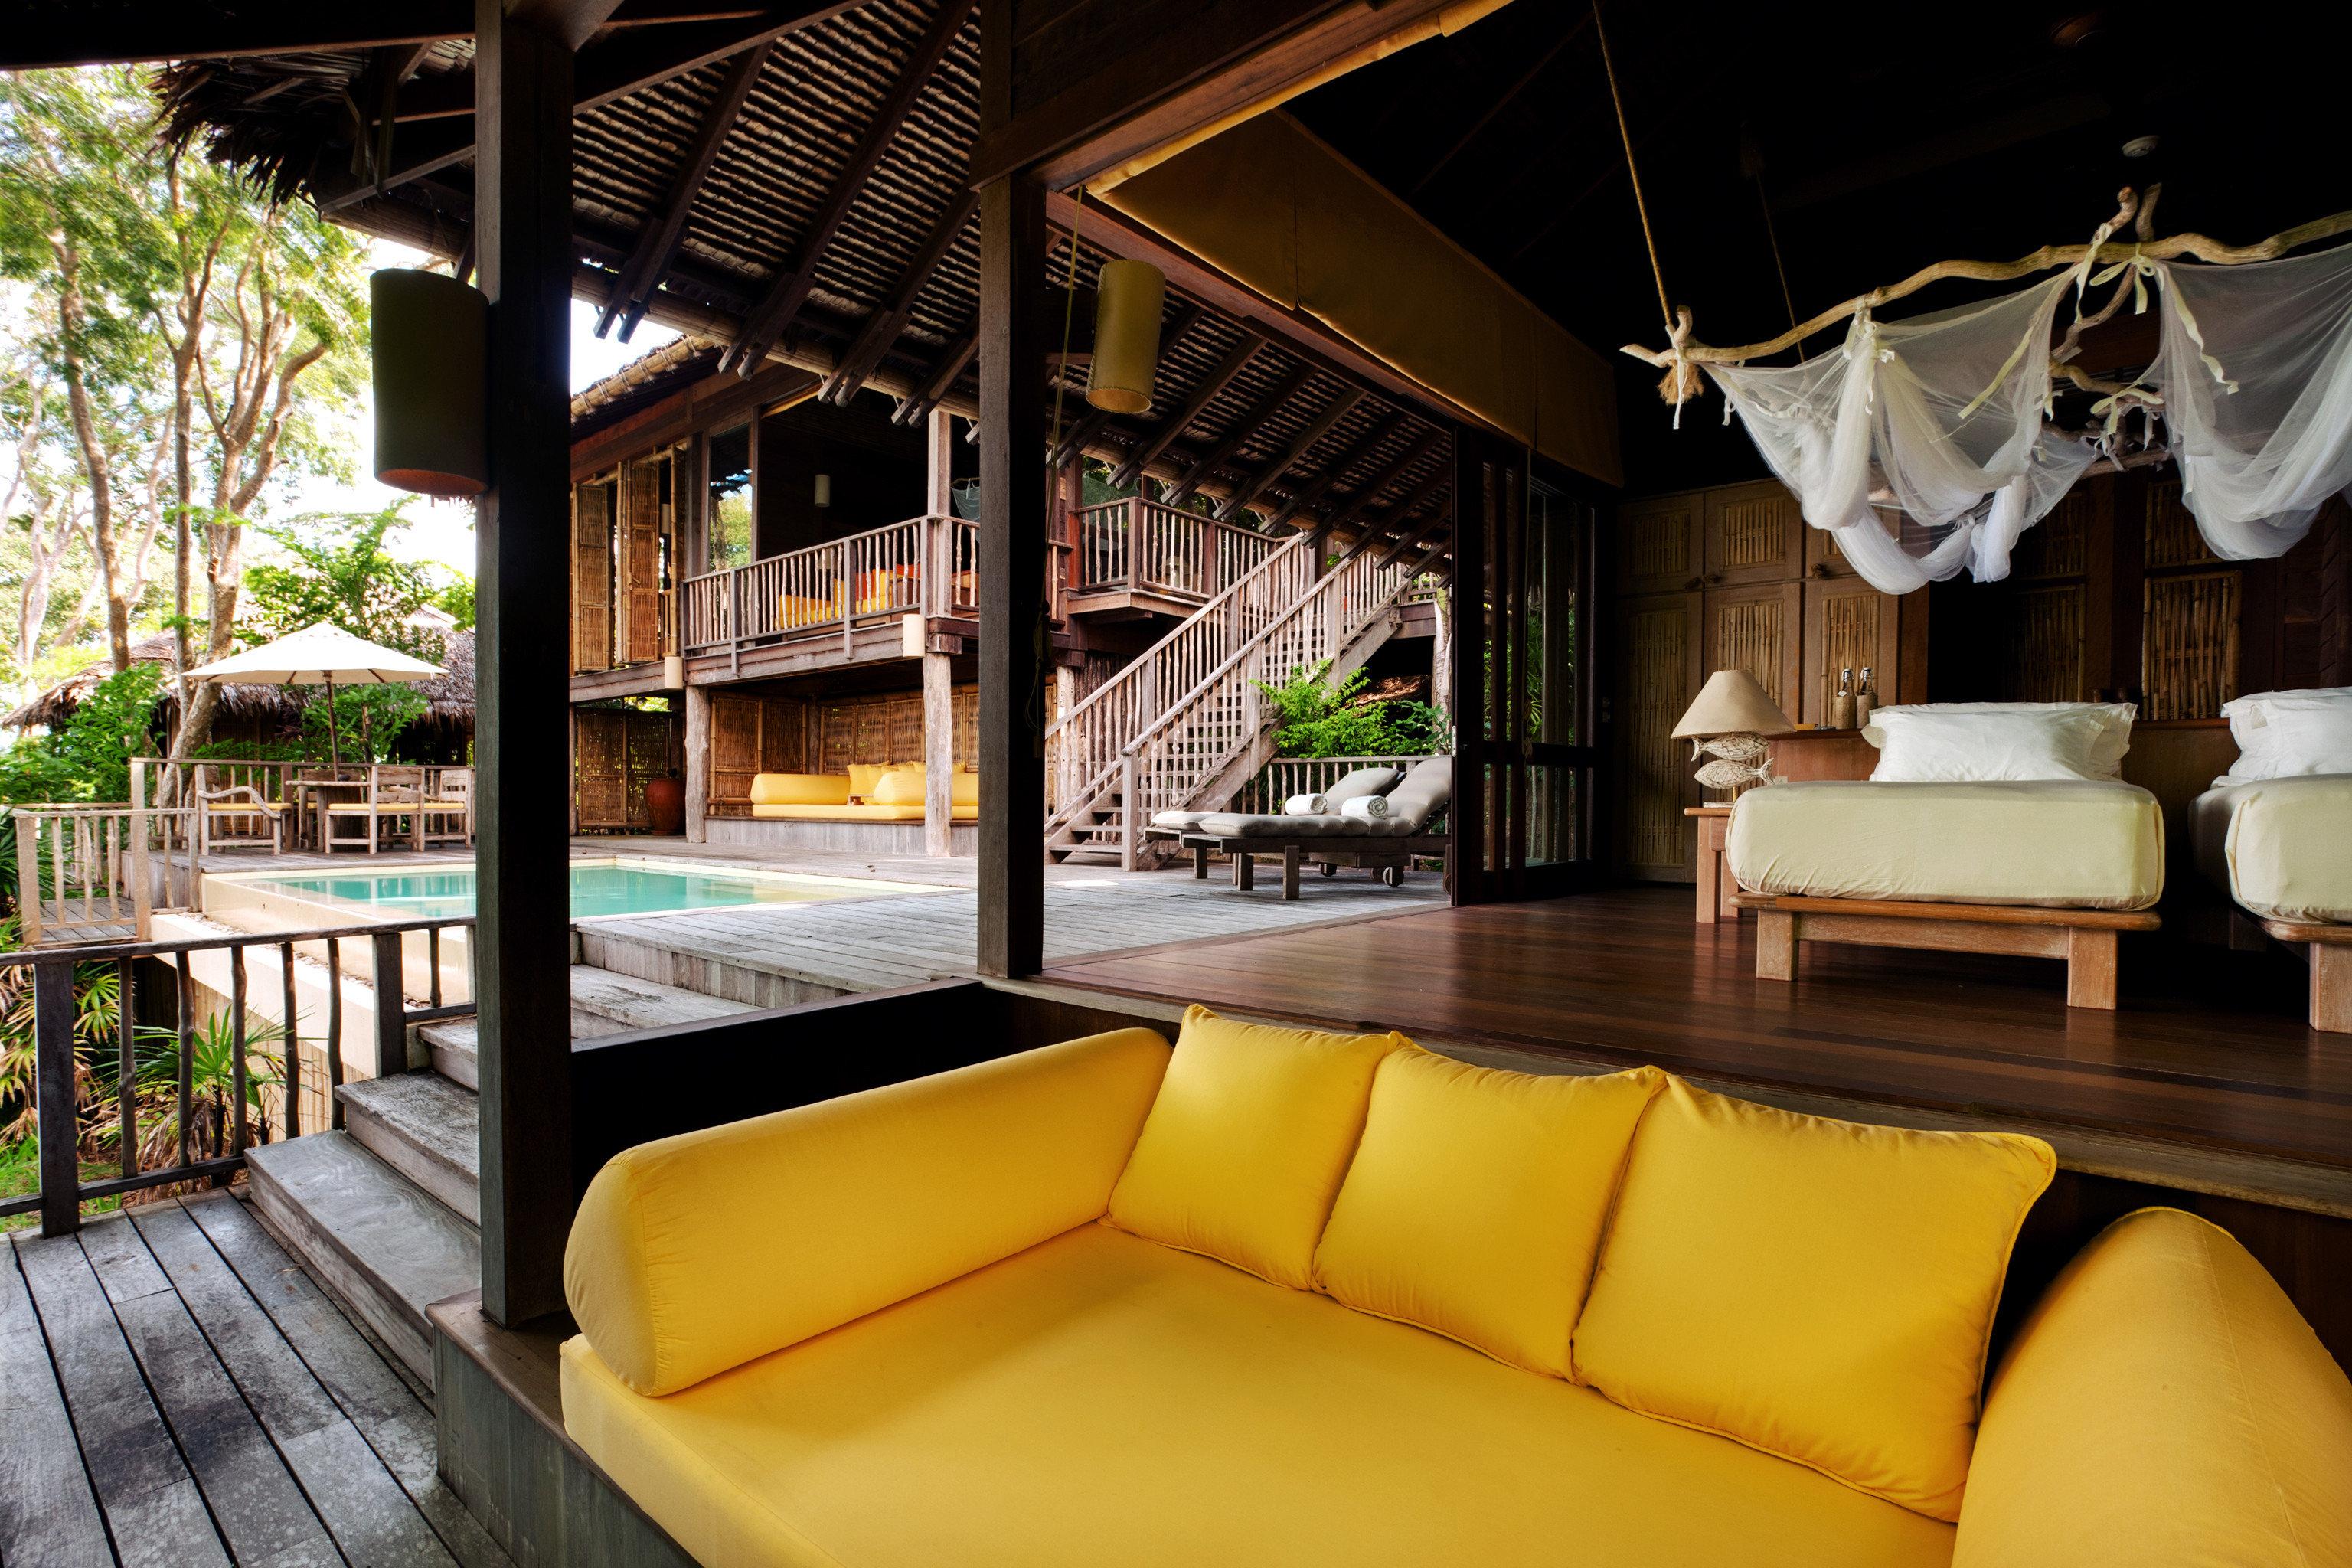 Beach Fitness Hotels Lounge Phuket Pool Thailand property Resort Villa eco hotel hacienda mansion